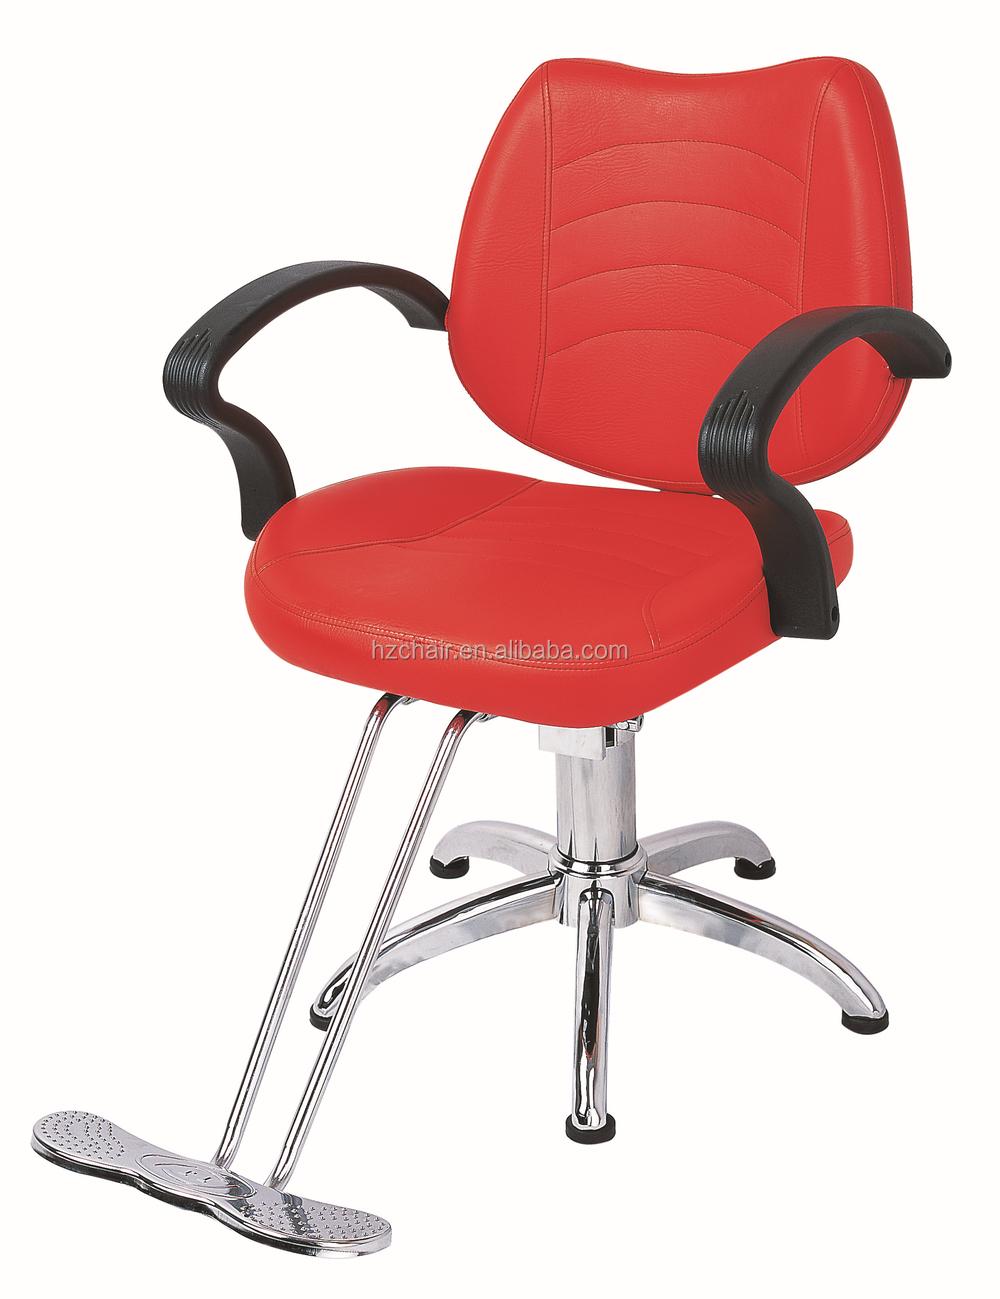 fauteuil coiffure pas cher. Black Bedroom Furniture Sets. Home Design Ideas